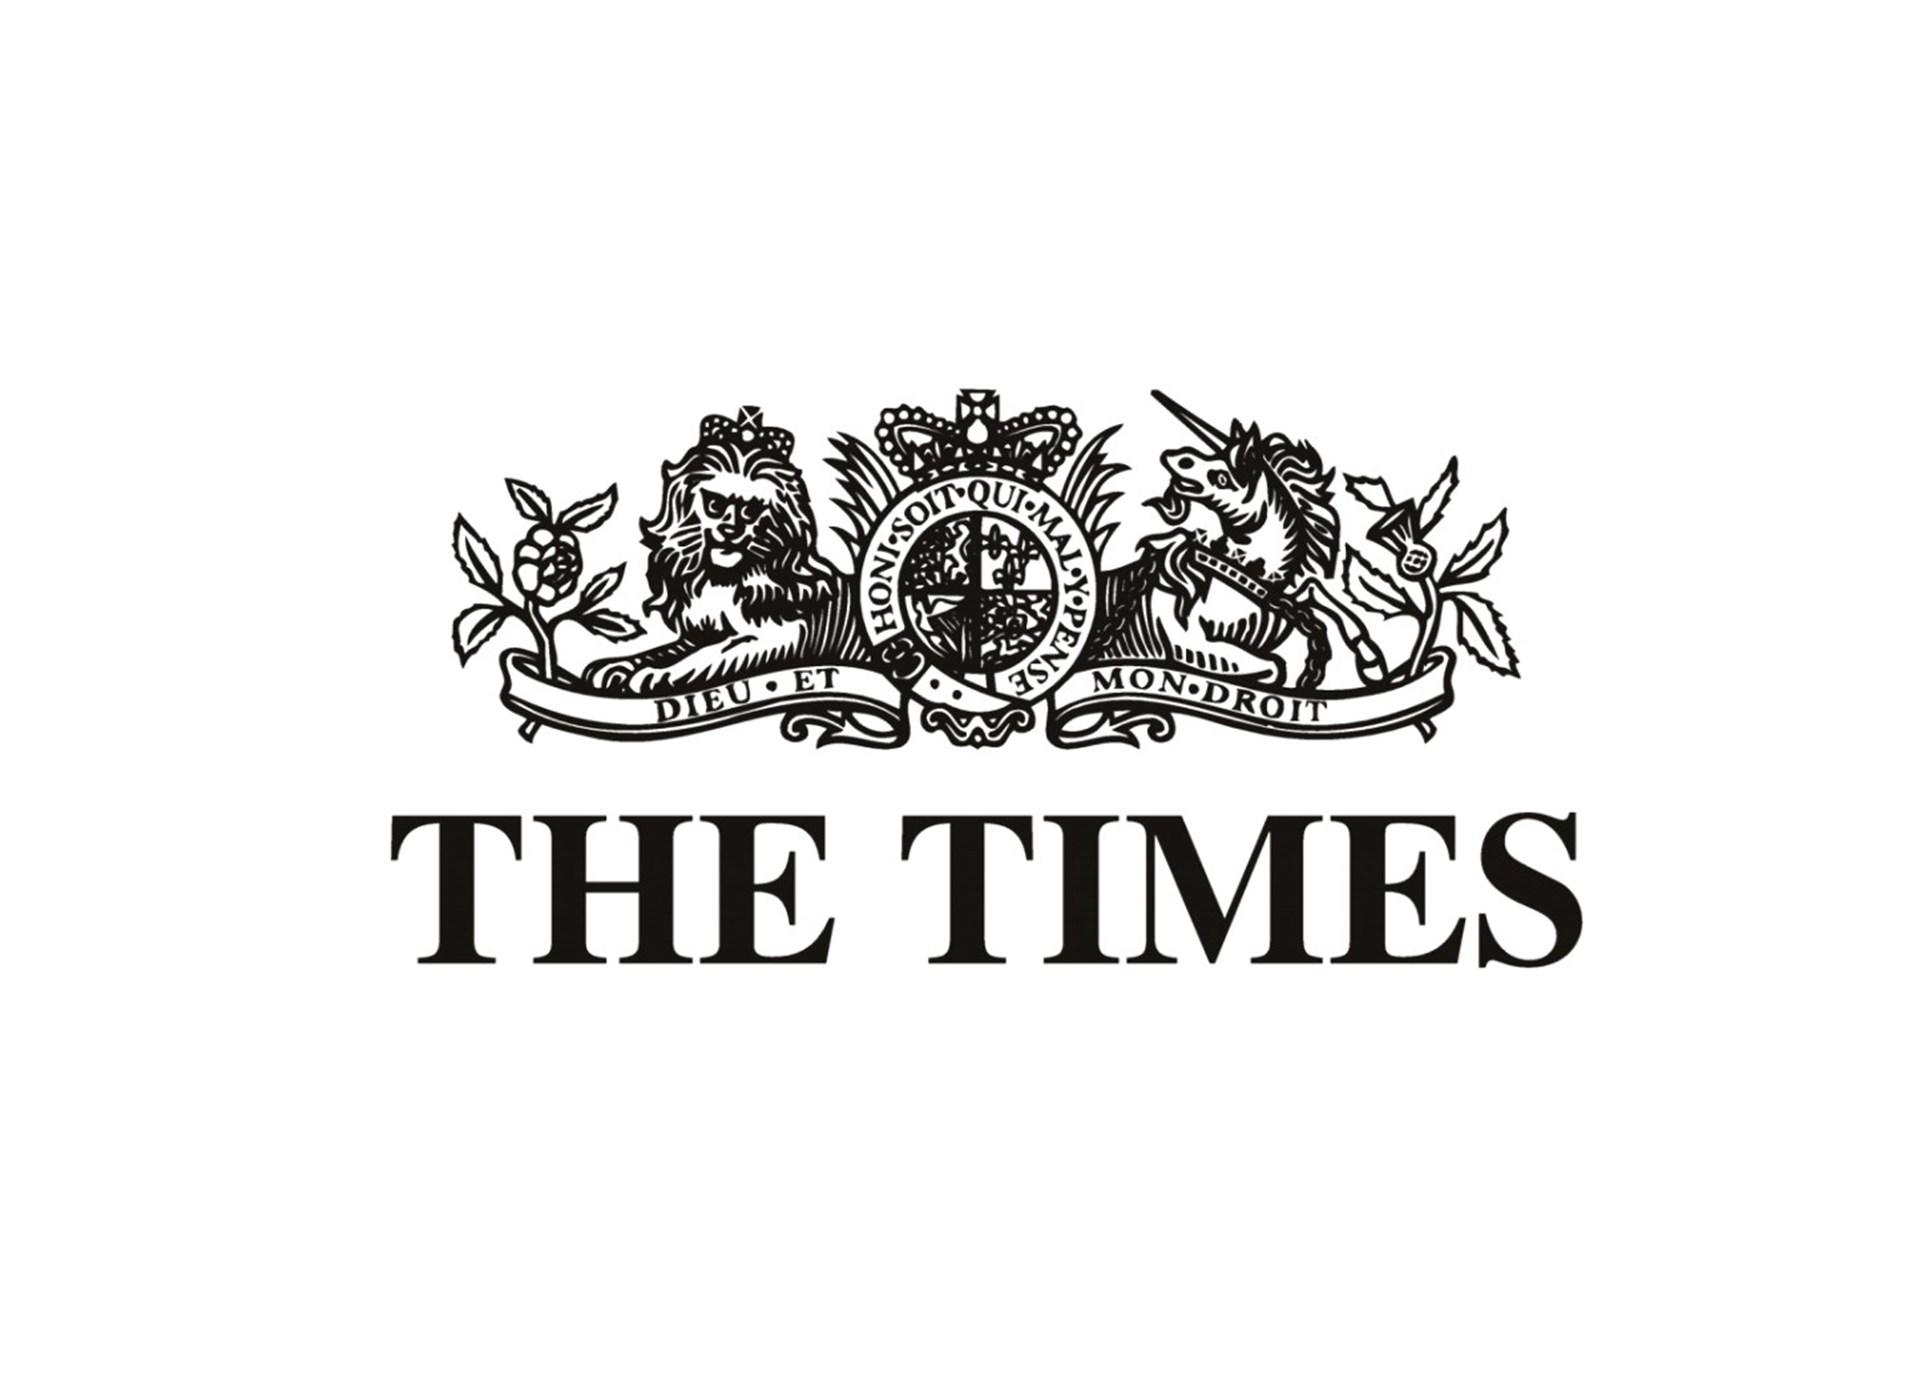 The Times: Embracing Friluftsliv (Indoor-Outdoor) Living